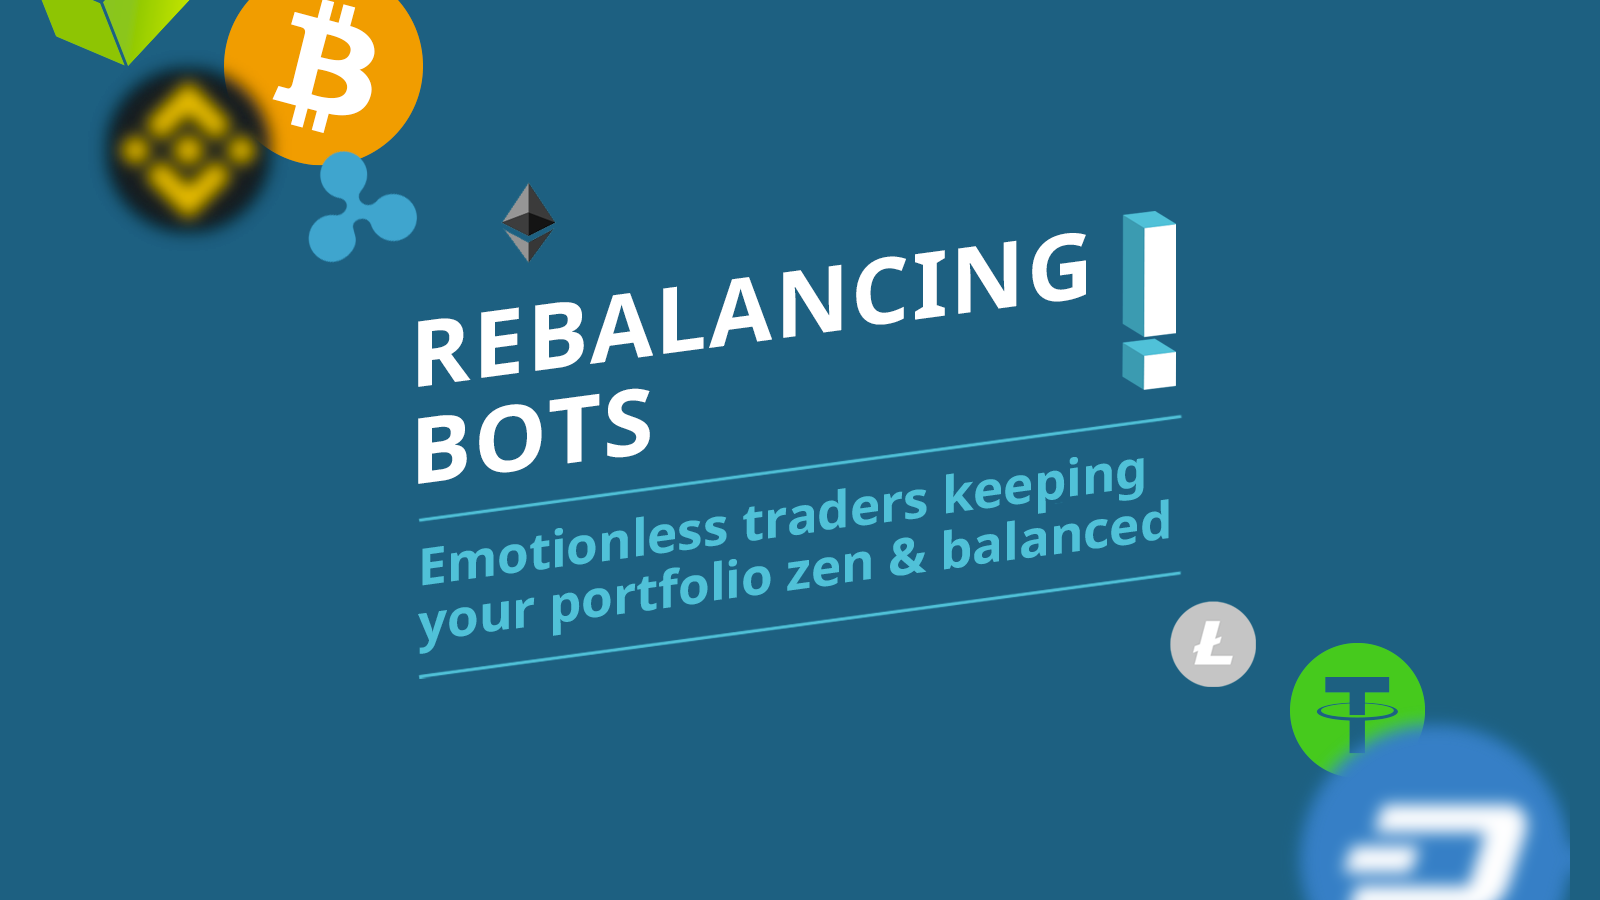 Rebalancing bots: Emotionless traders keeping your portfolio zen andbalanced